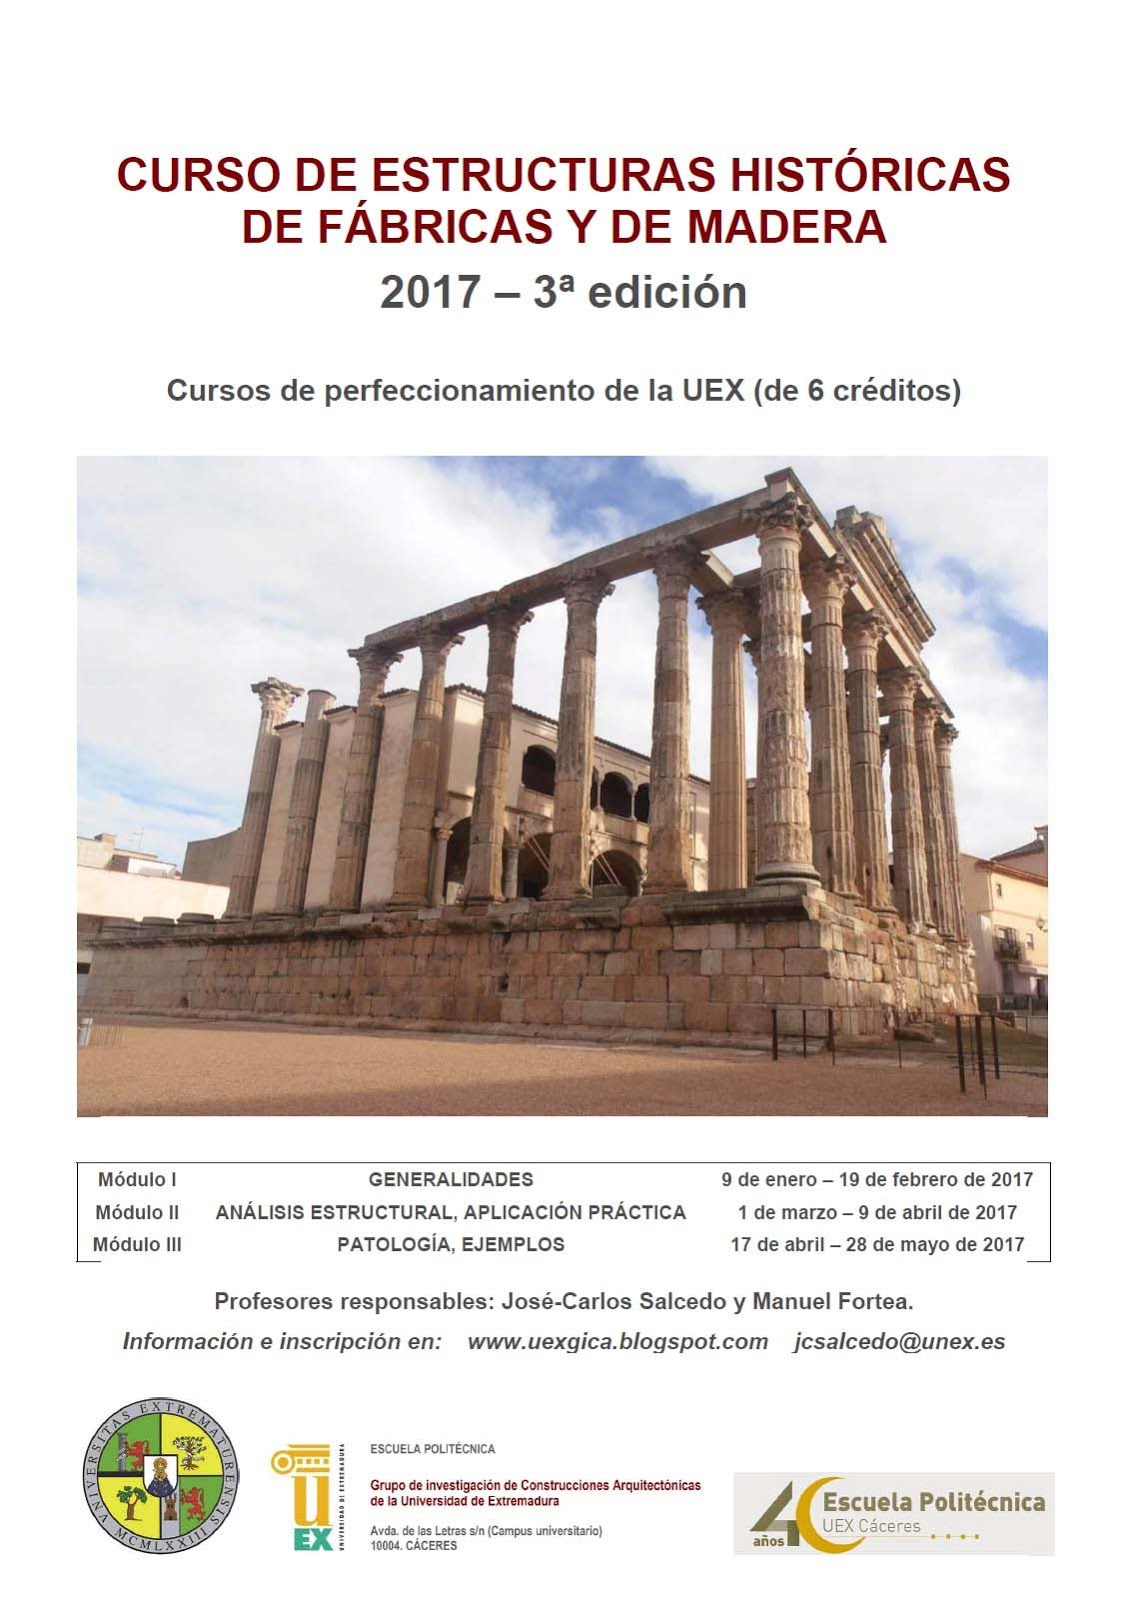 CURSO DE ESTRUCTURAS HISTÓRICAS